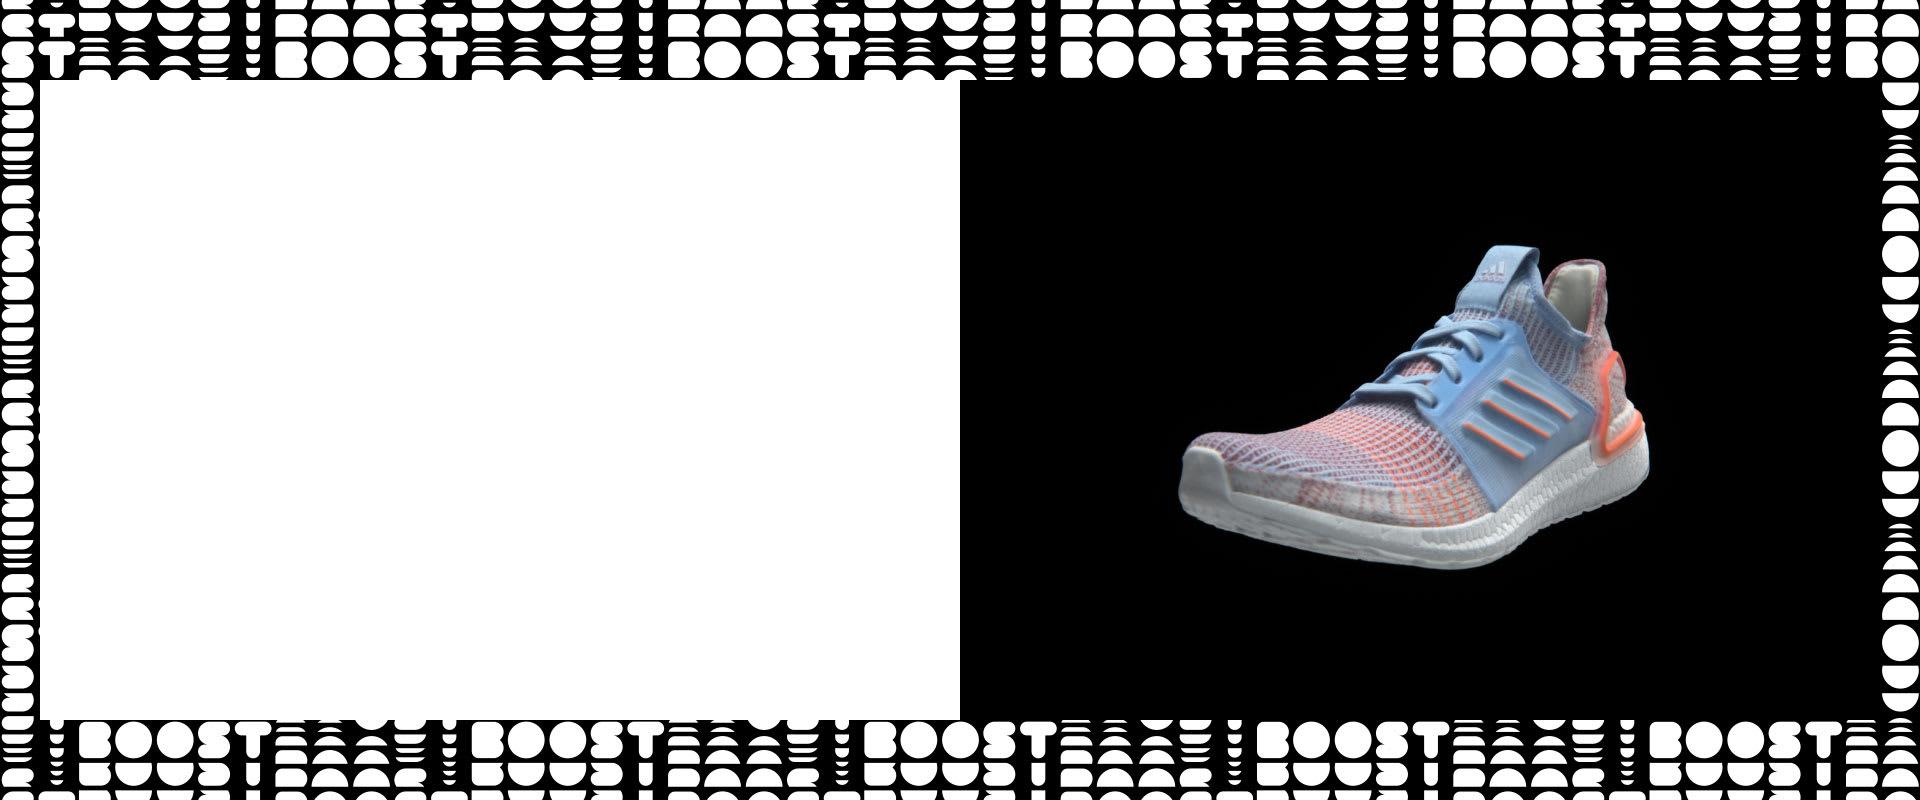 af4b2964f7 adidas® Store Ufficiale Italia |Articoli sportivi